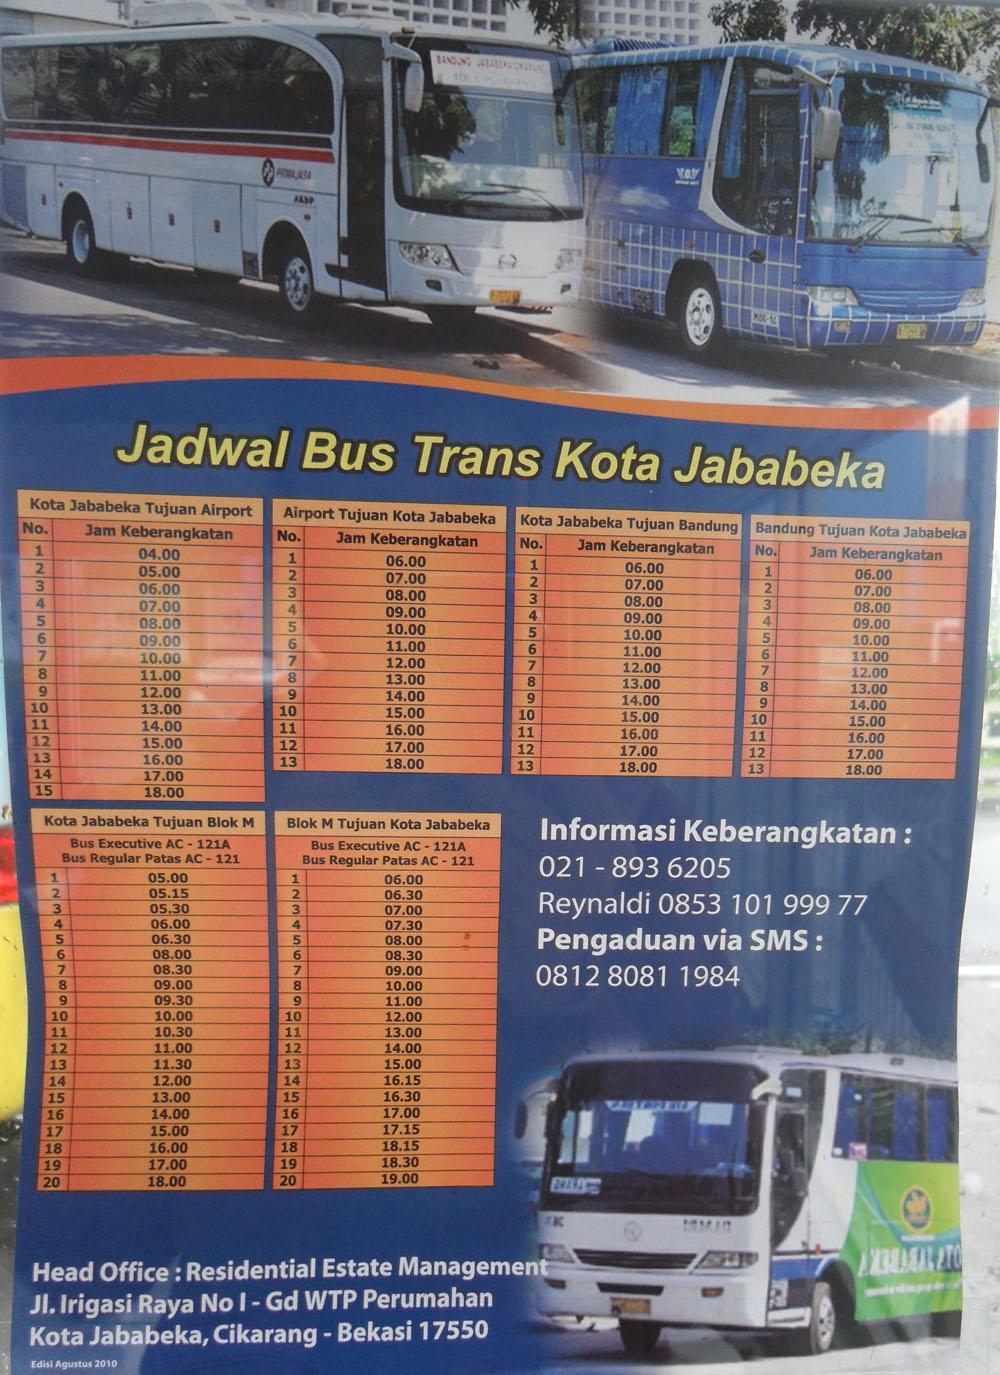 Jadwal Bus Trans Kota Jababeka